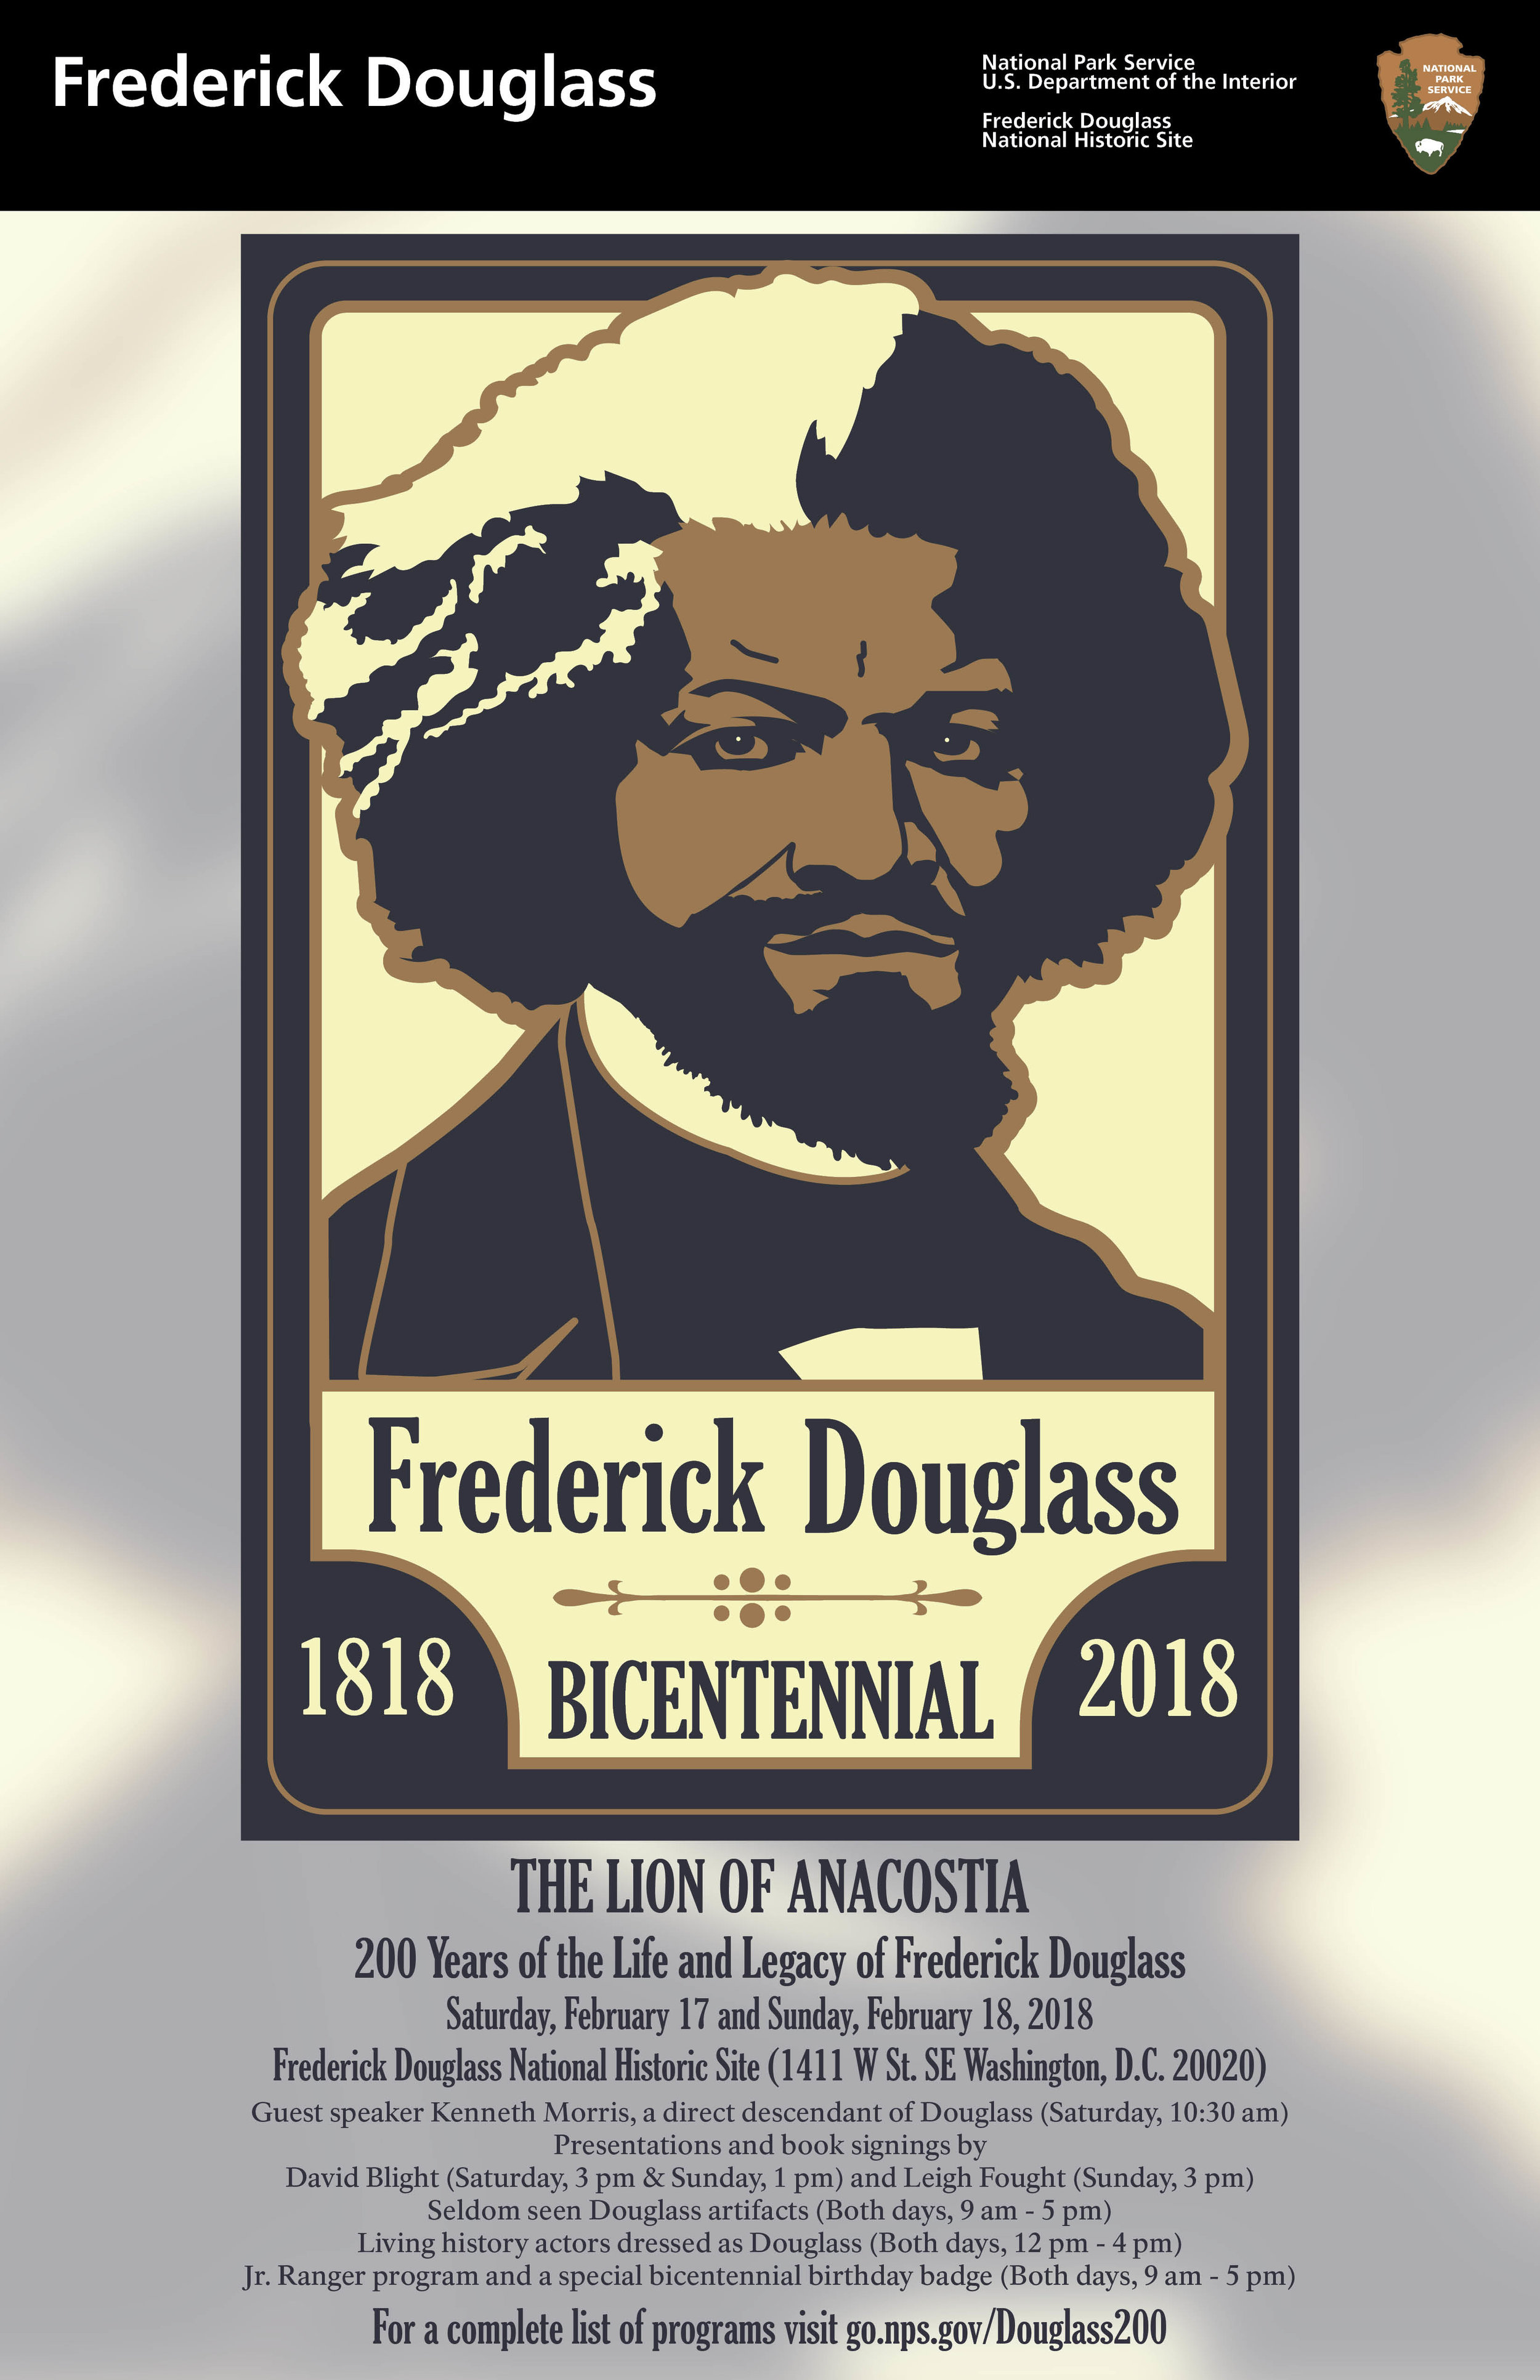 FRDOBicentennial-Poster.jpg